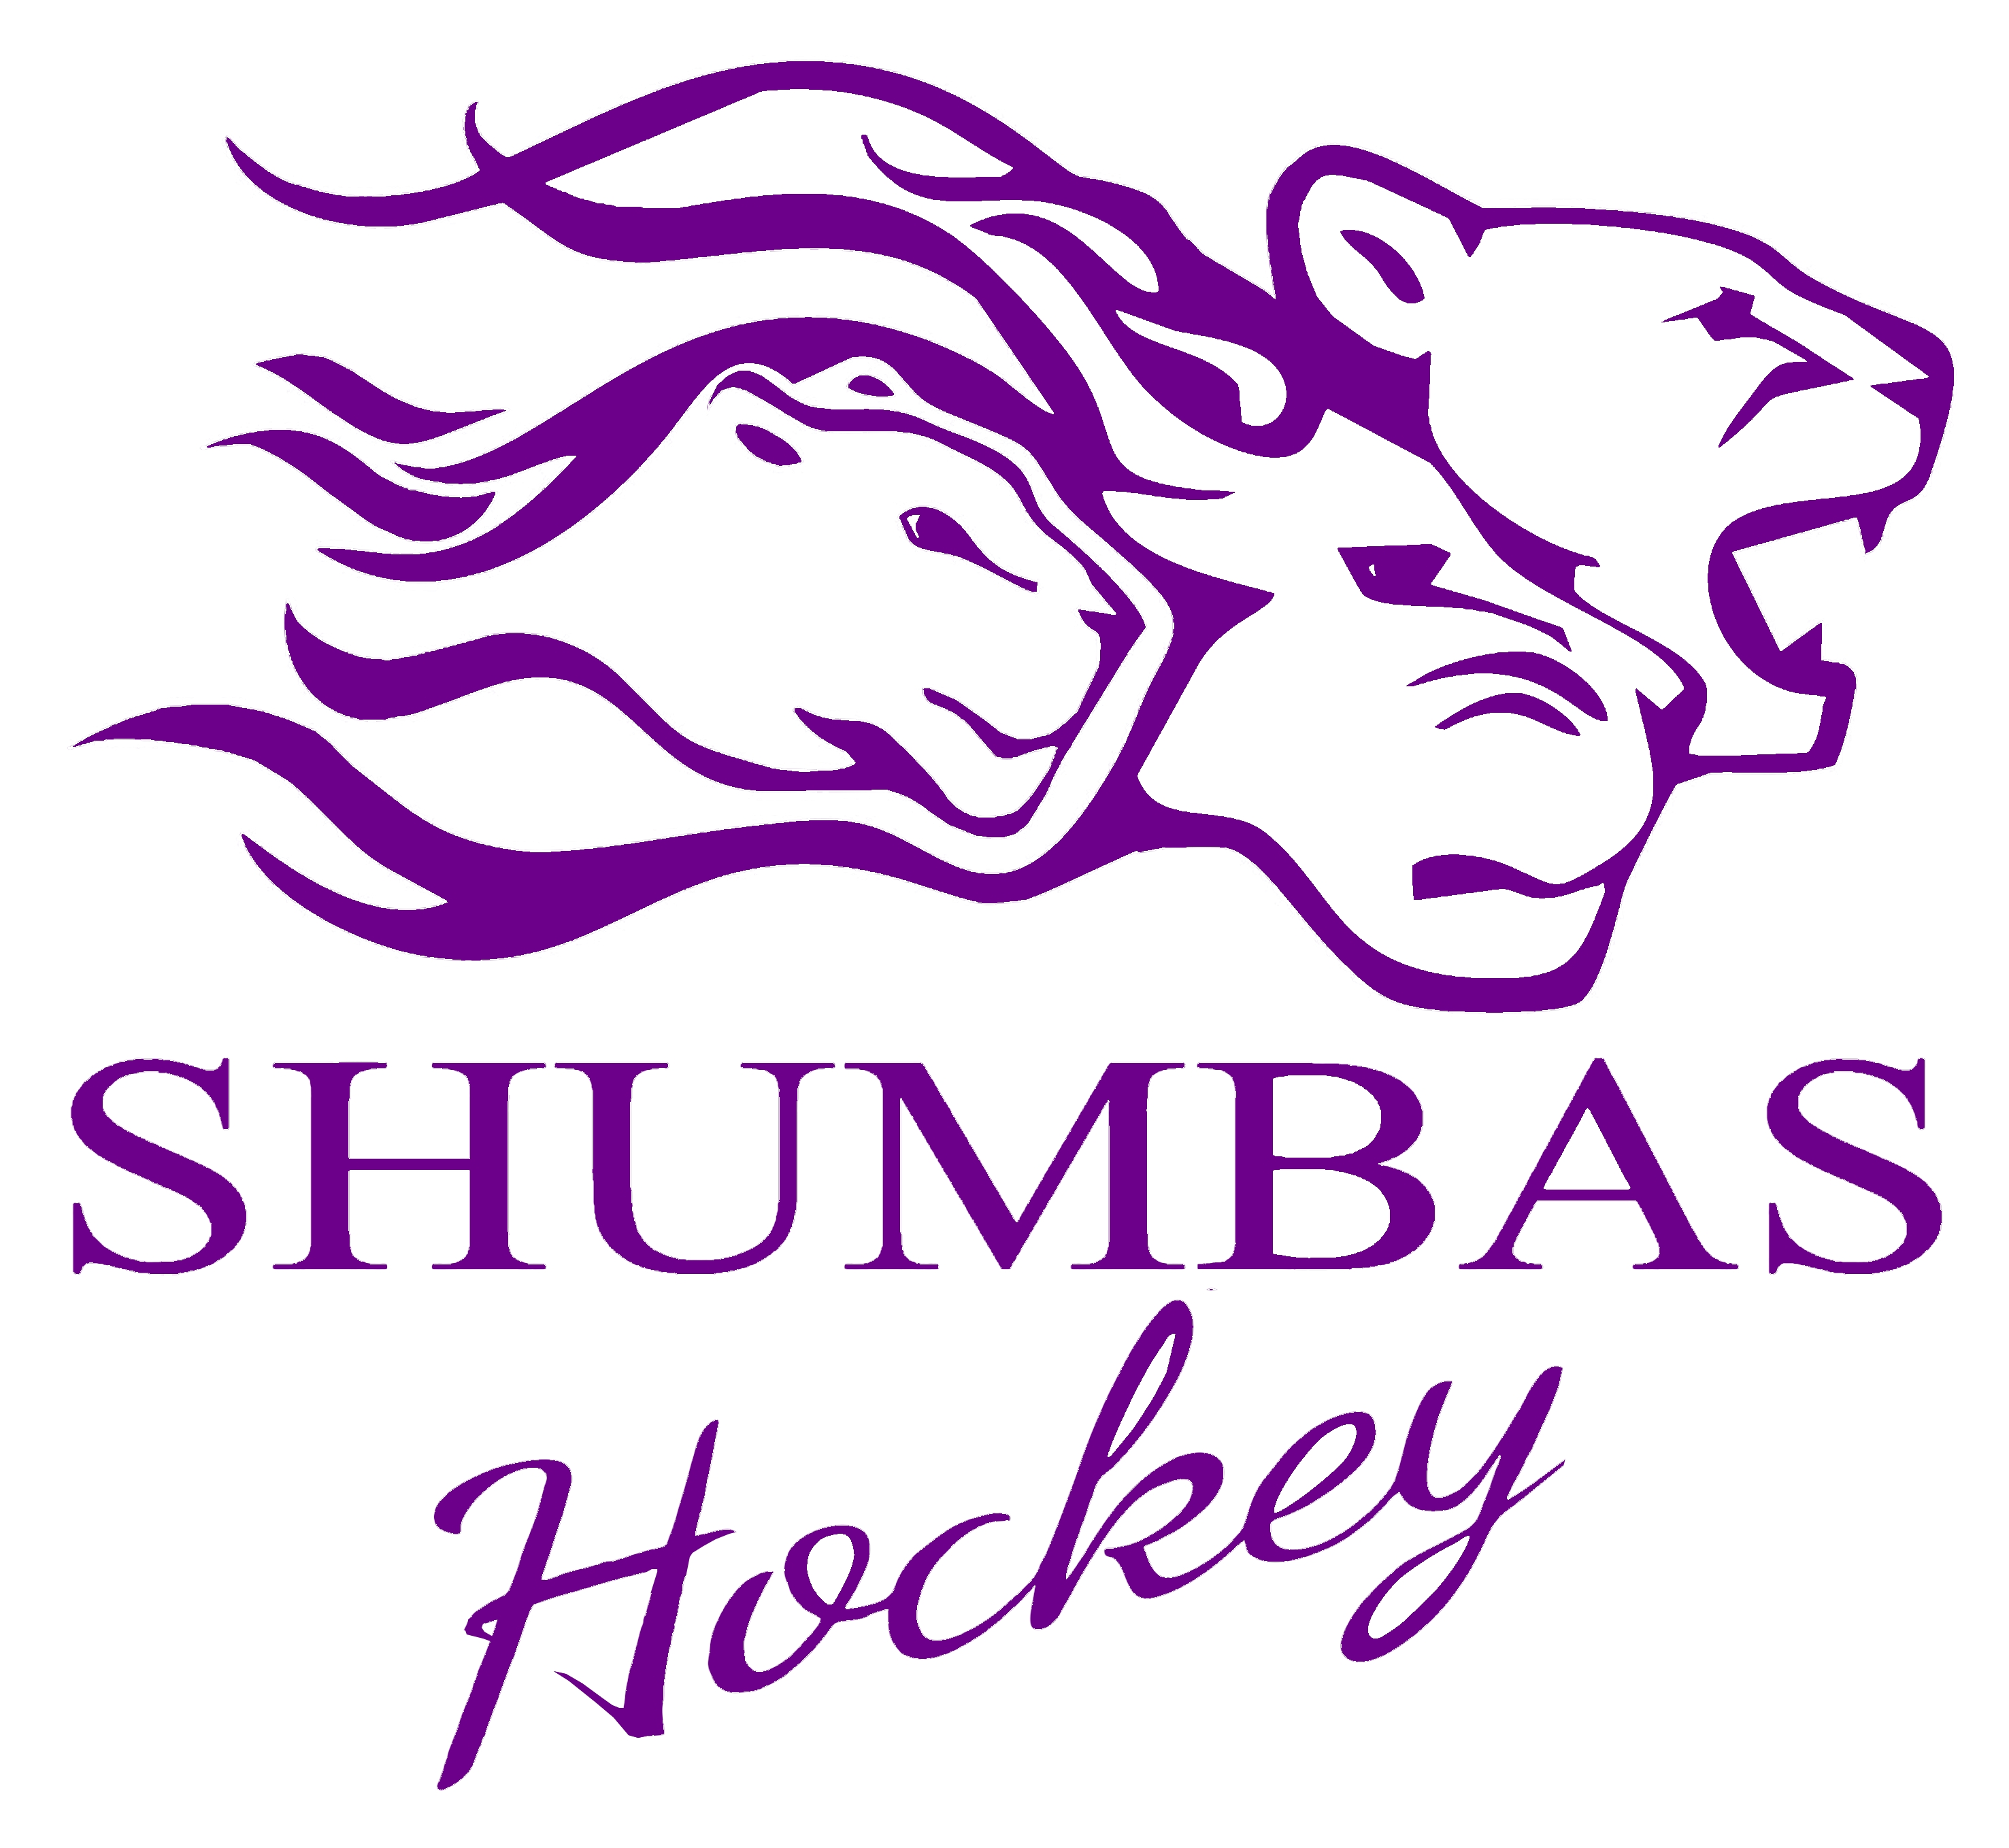 Shumbas